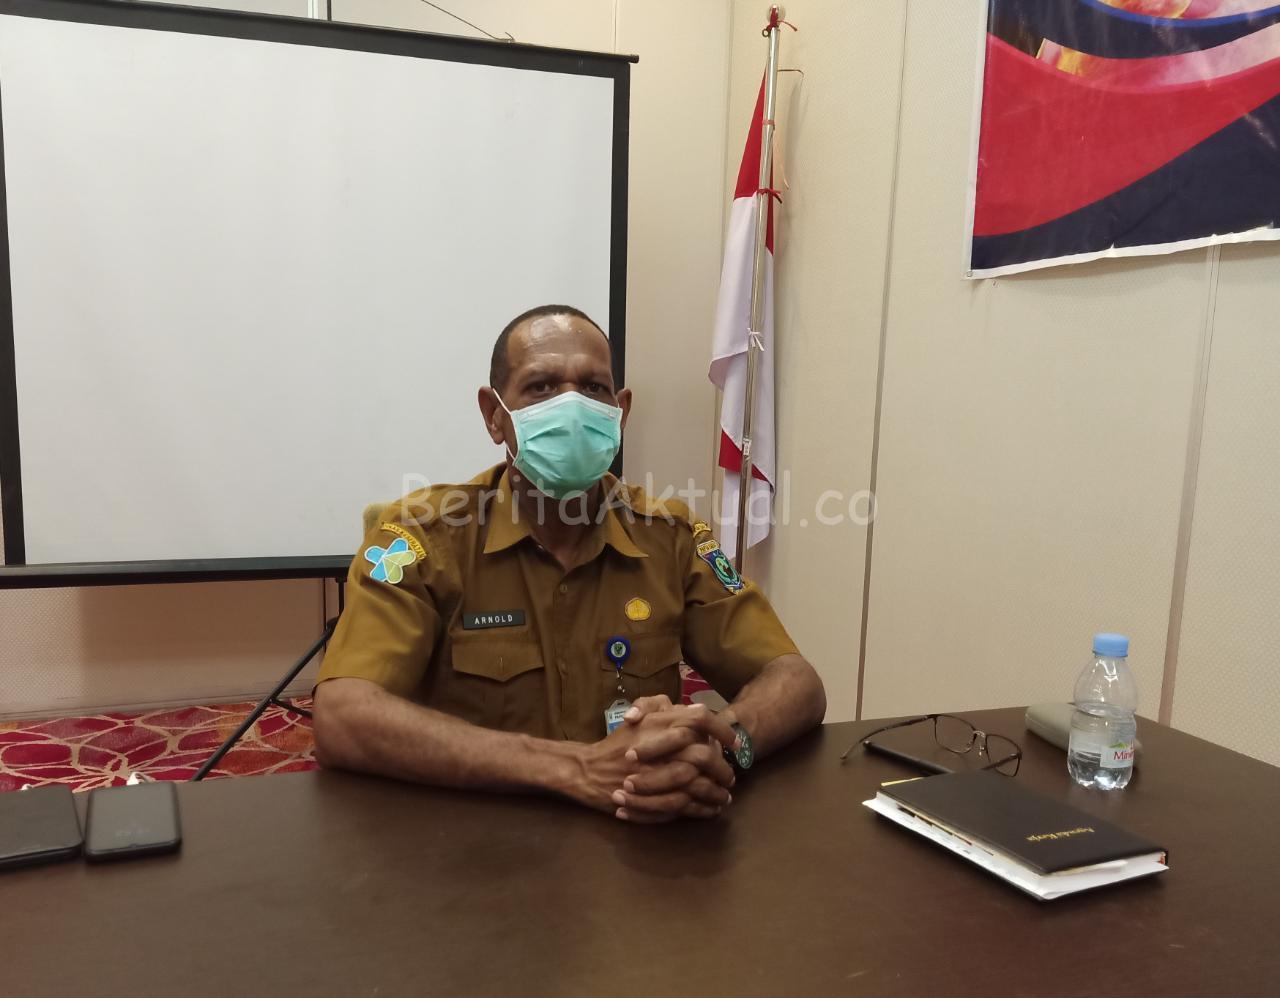 Sampai Hari ini Senin 4 Mei, Papua Barat Tidak Ada Penambahan Pasien Positif 4 IMG 20200504 WA0045